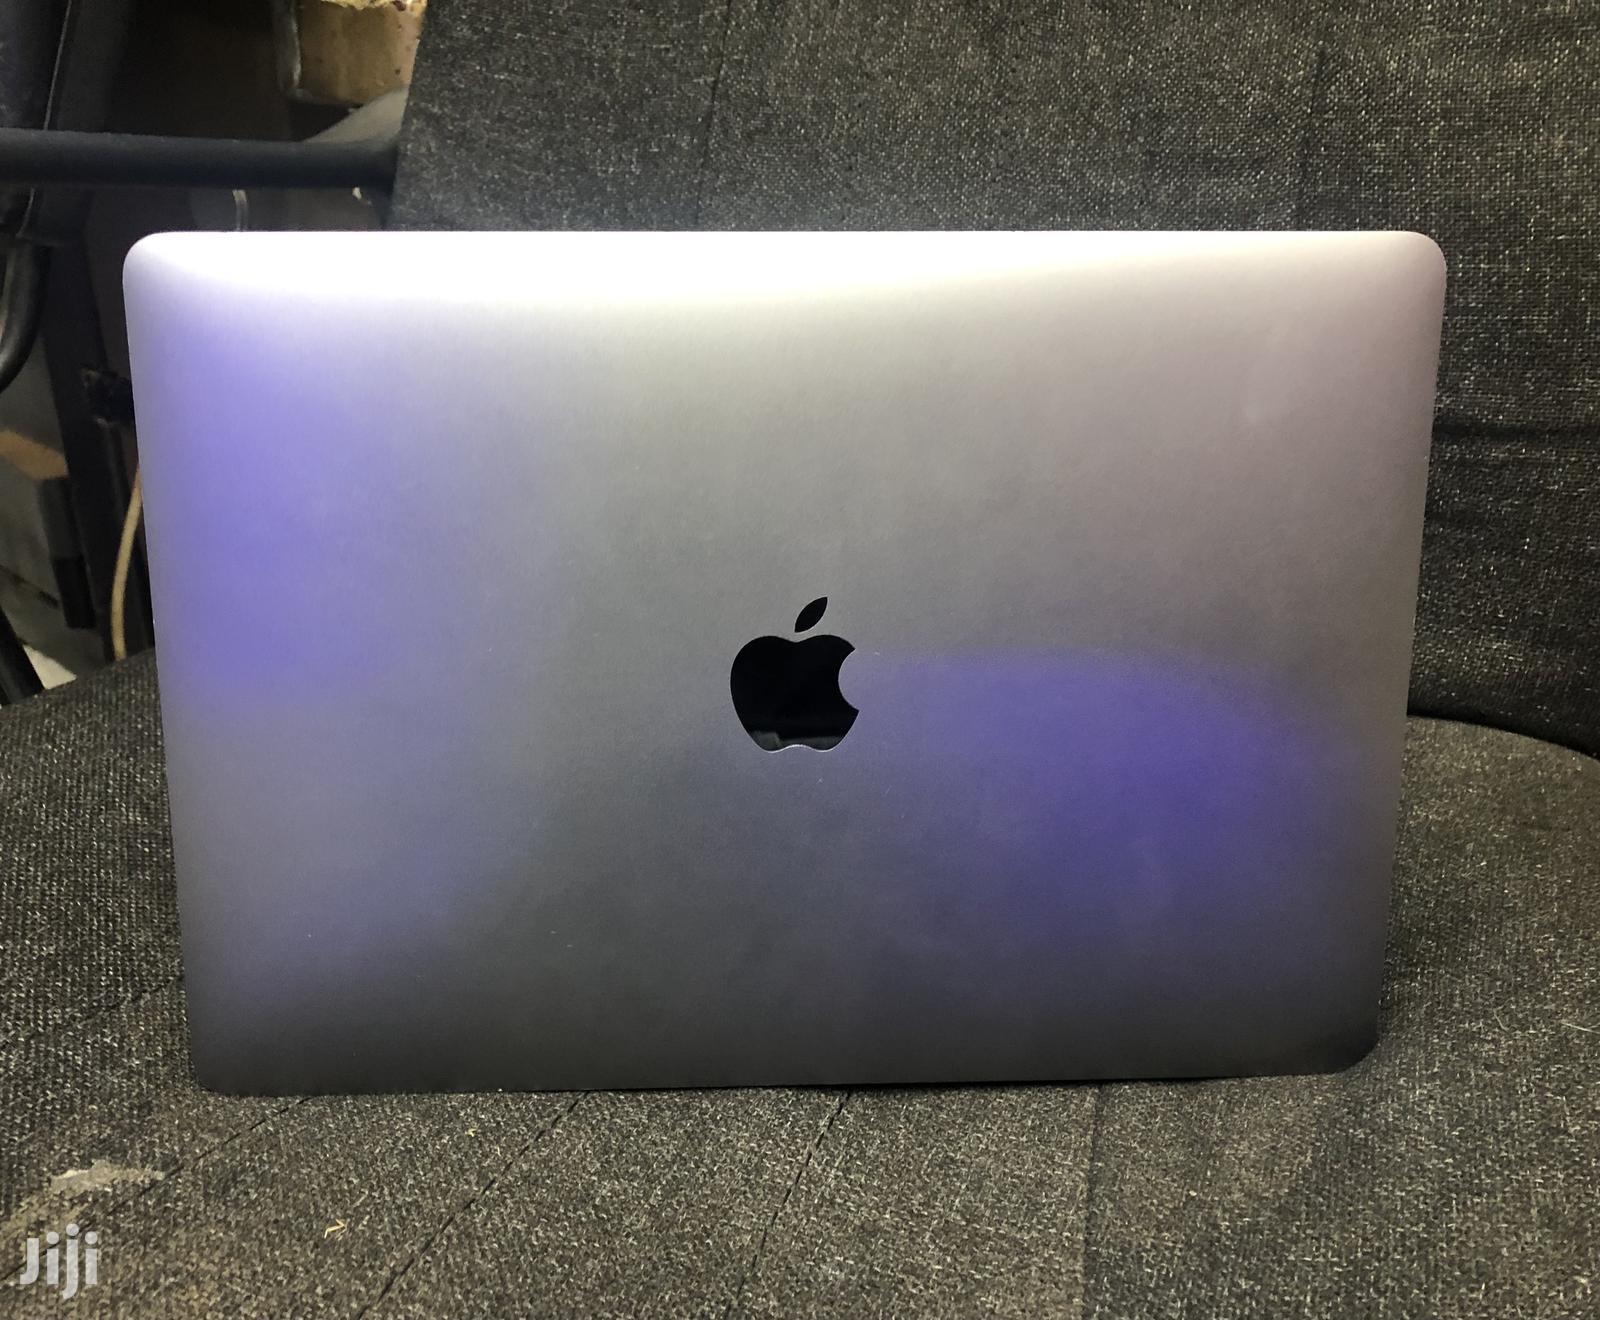 Laptop Apple MacBook Pro 8GB Intel Core I5 SSD 256GB   Laptops & Computers for sale in Kampala, Central Region, Uganda